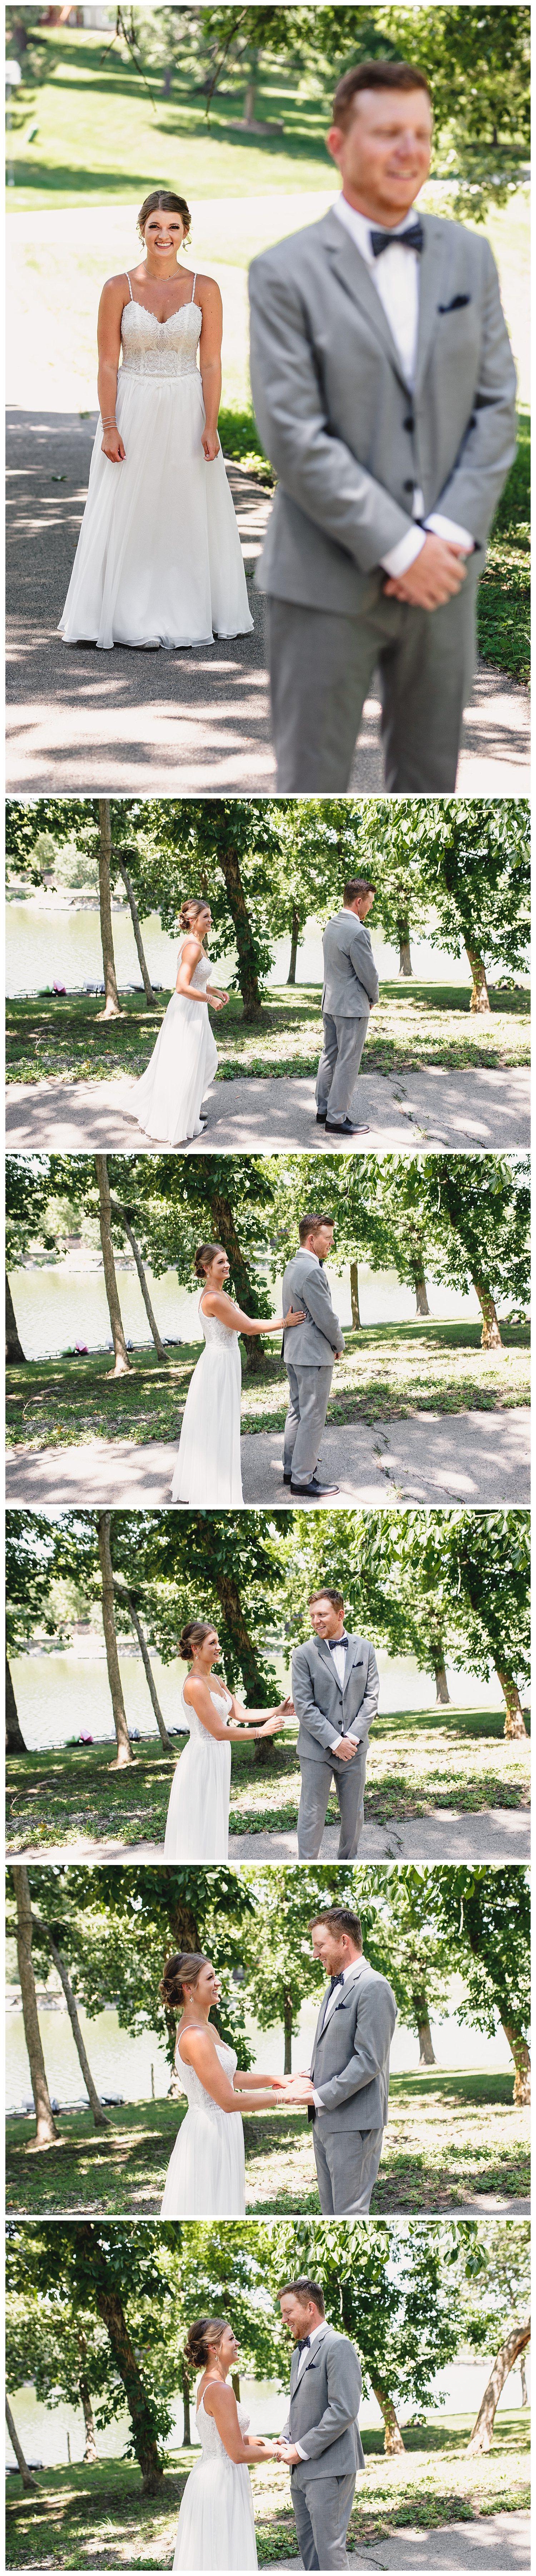 Kelsey_Diane_Photography_Kansas_City_Engagement_Wedding_Photographer_Midwest_Traveling_Missouri_Lee_Andrew_Hall_And_Garden_Blue_Springs_Wedding_Clayton_Kimberly_Summer_Wedding_0816.jpg